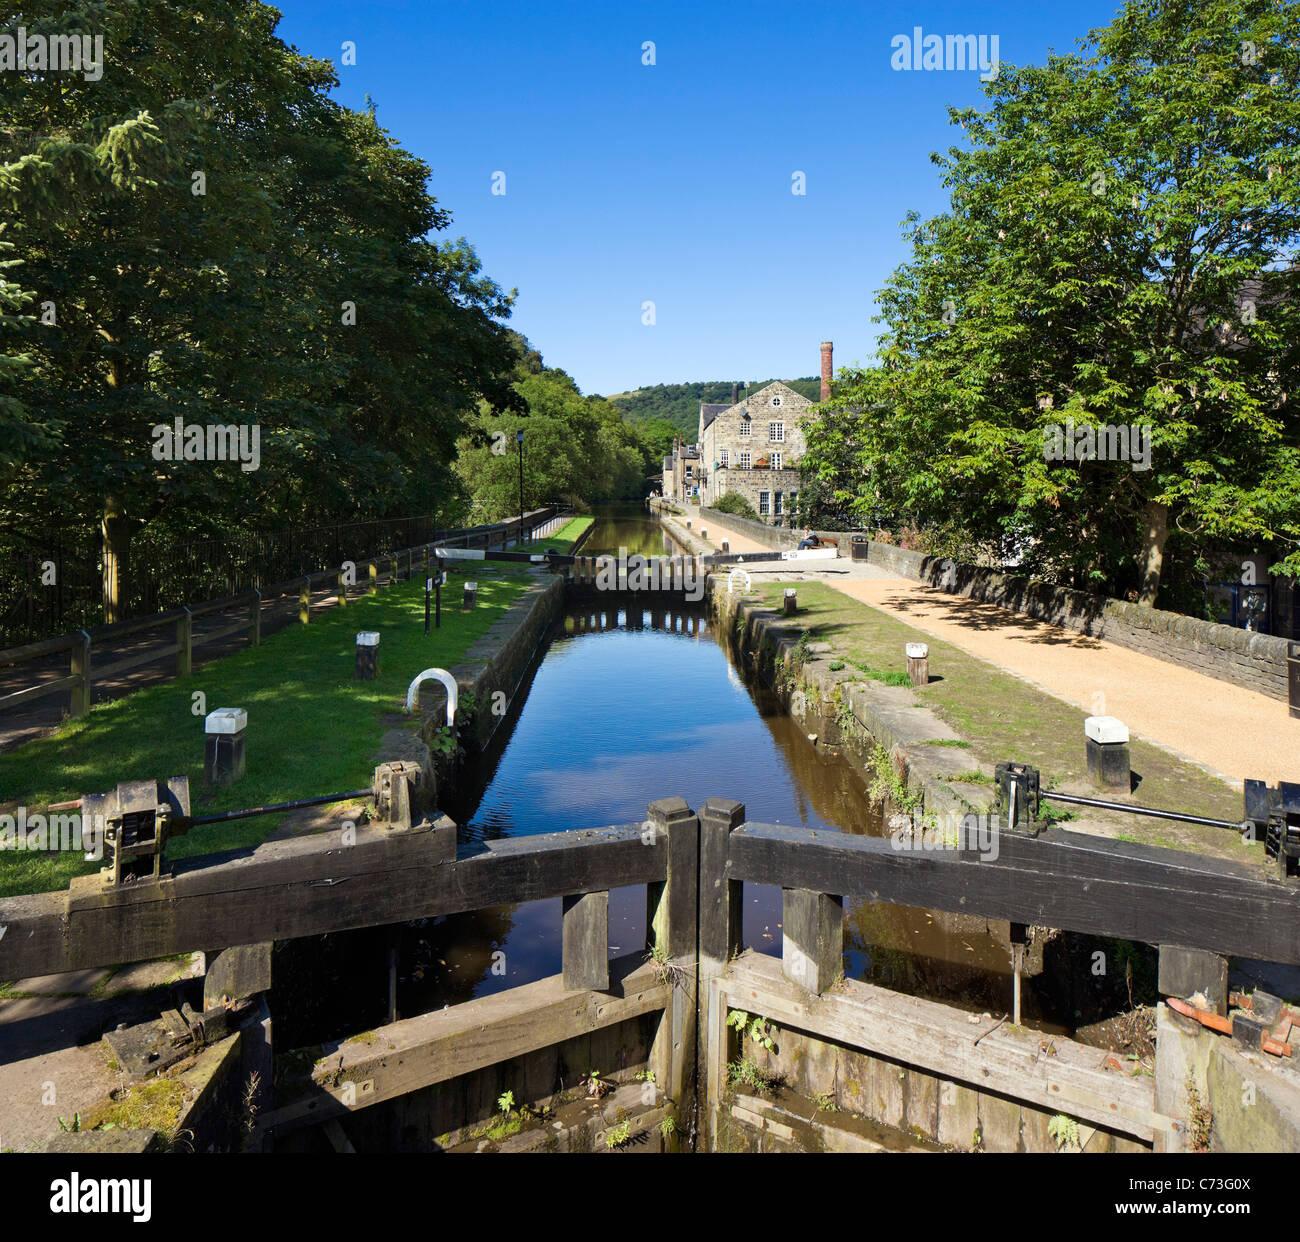 Lock gates on the Rochdale Canal, Hebden Bridge, Calder Valley, West Yorkshire, England, United Kingdom - Stock Image